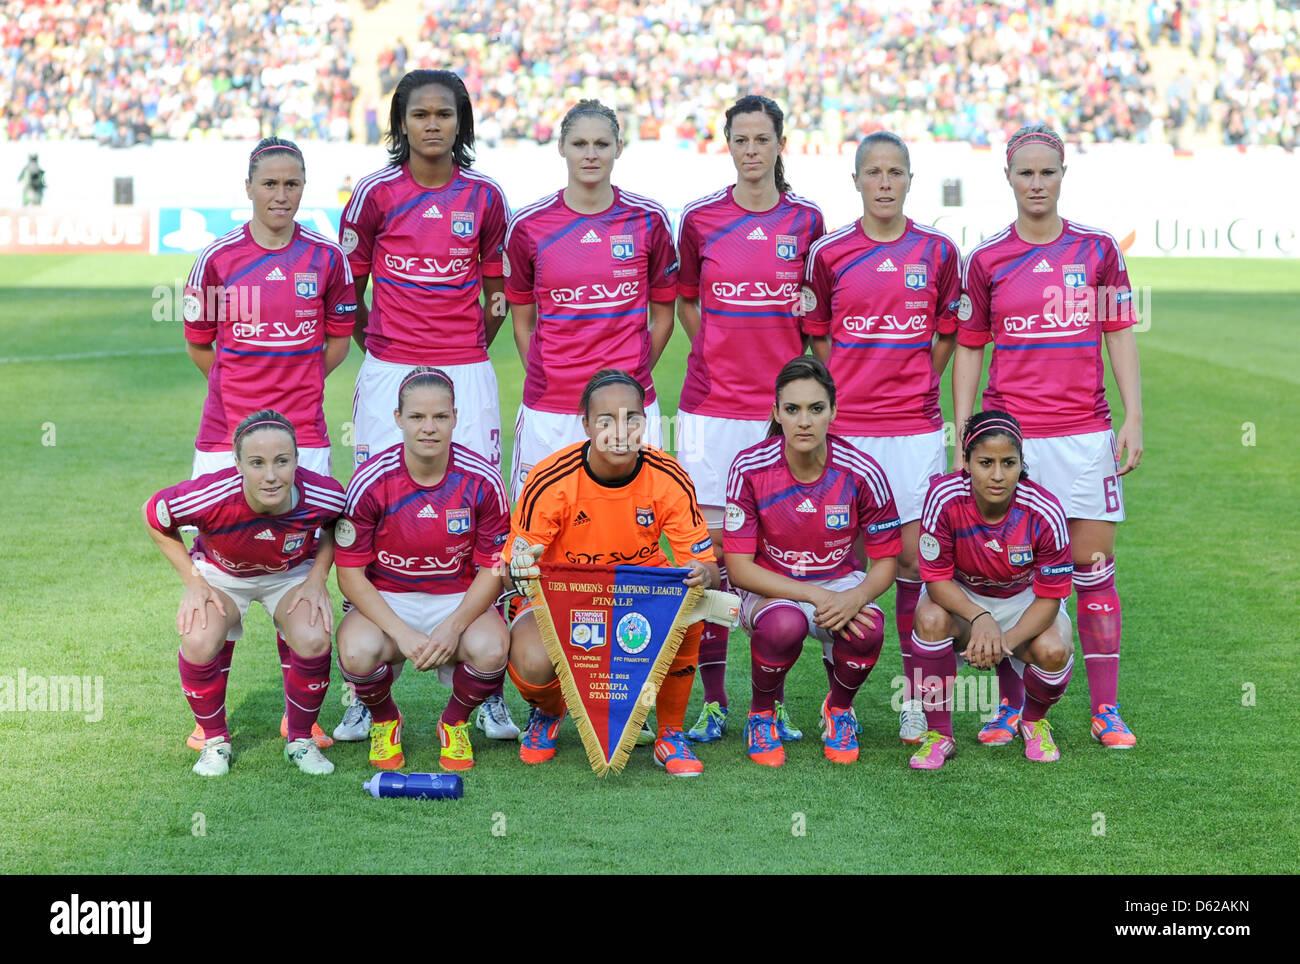 Wendy renard interview - Lyonnais Team Poses For A Photo Back L R Camille Abily Wendie Renard